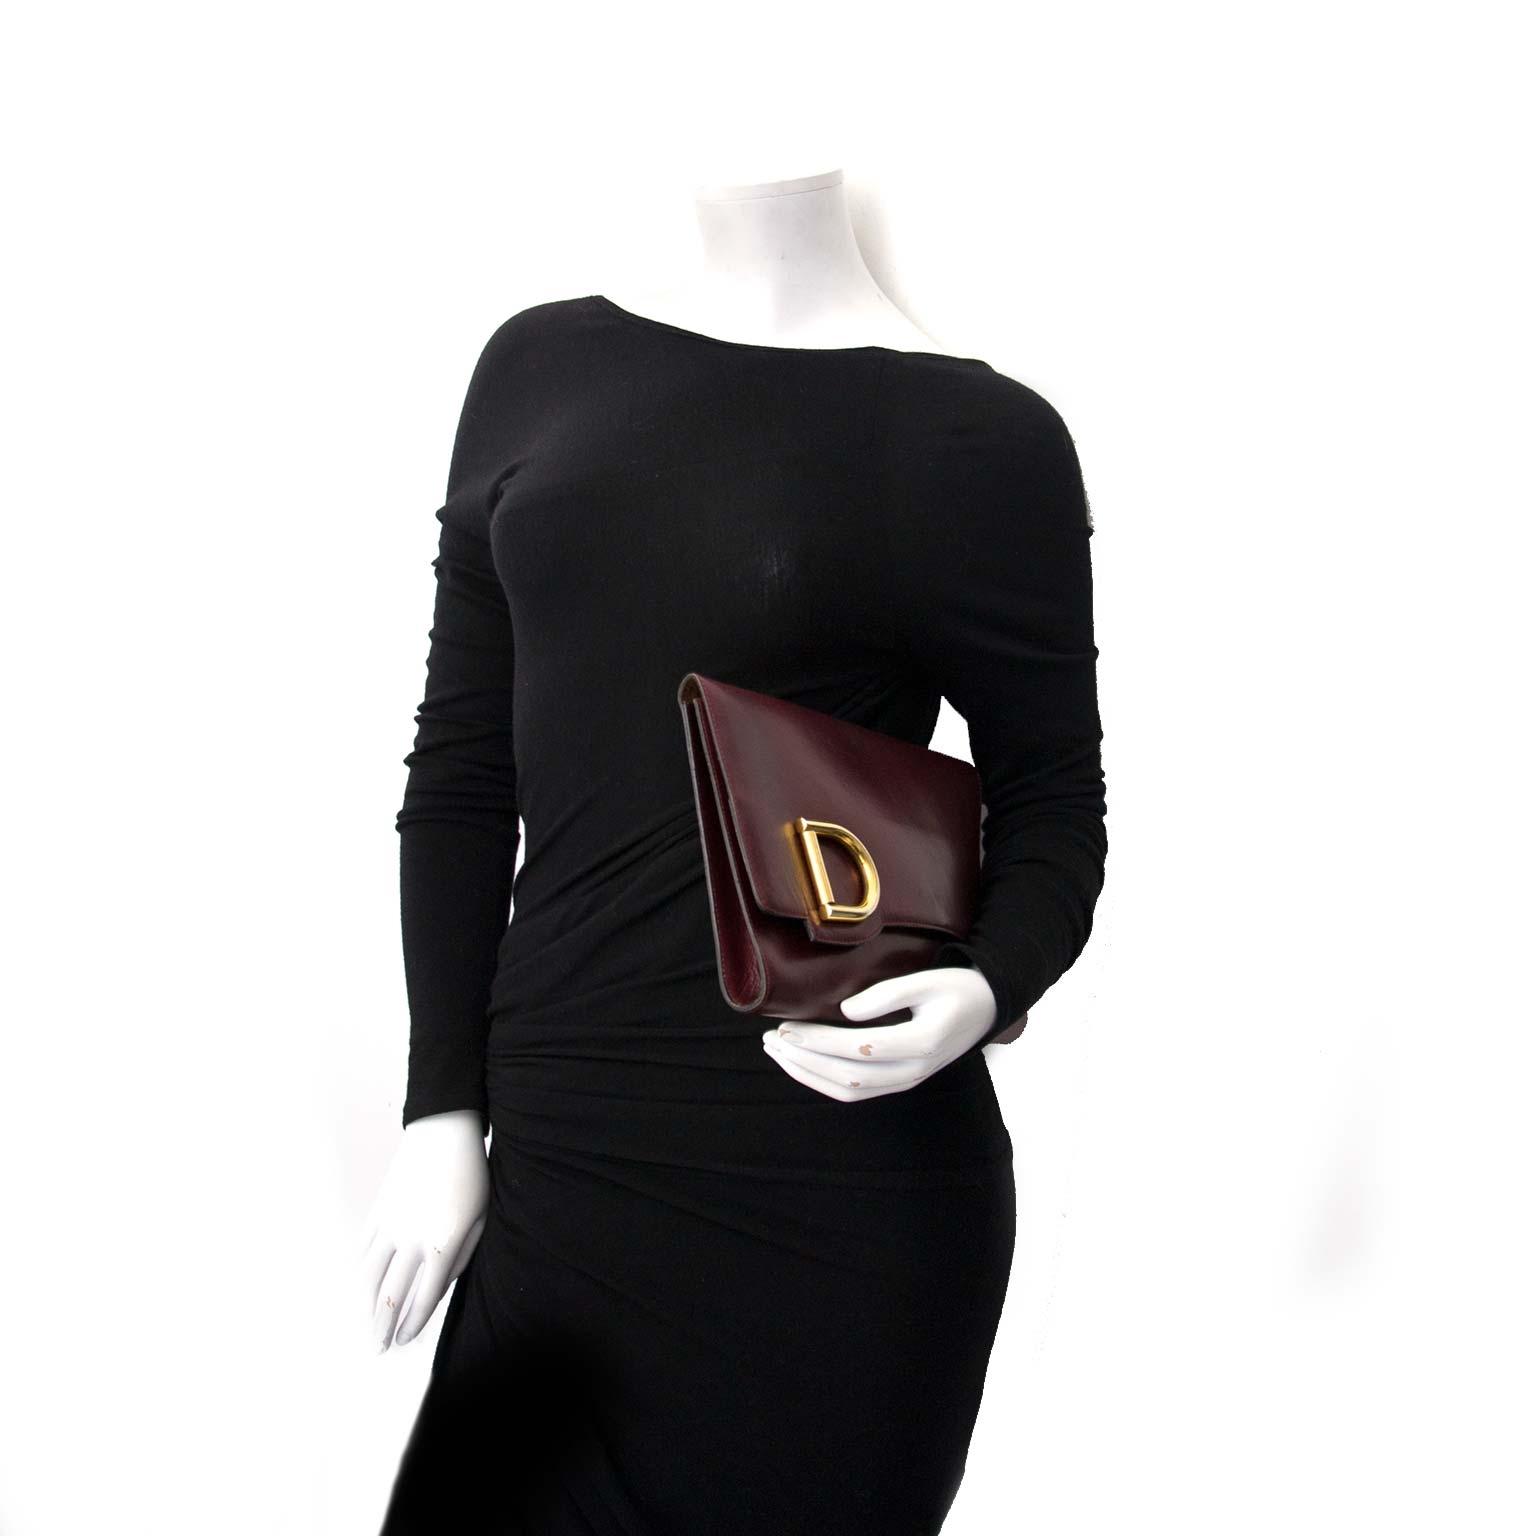 Buy your designer bags for less at Labellov, vintage webshop.